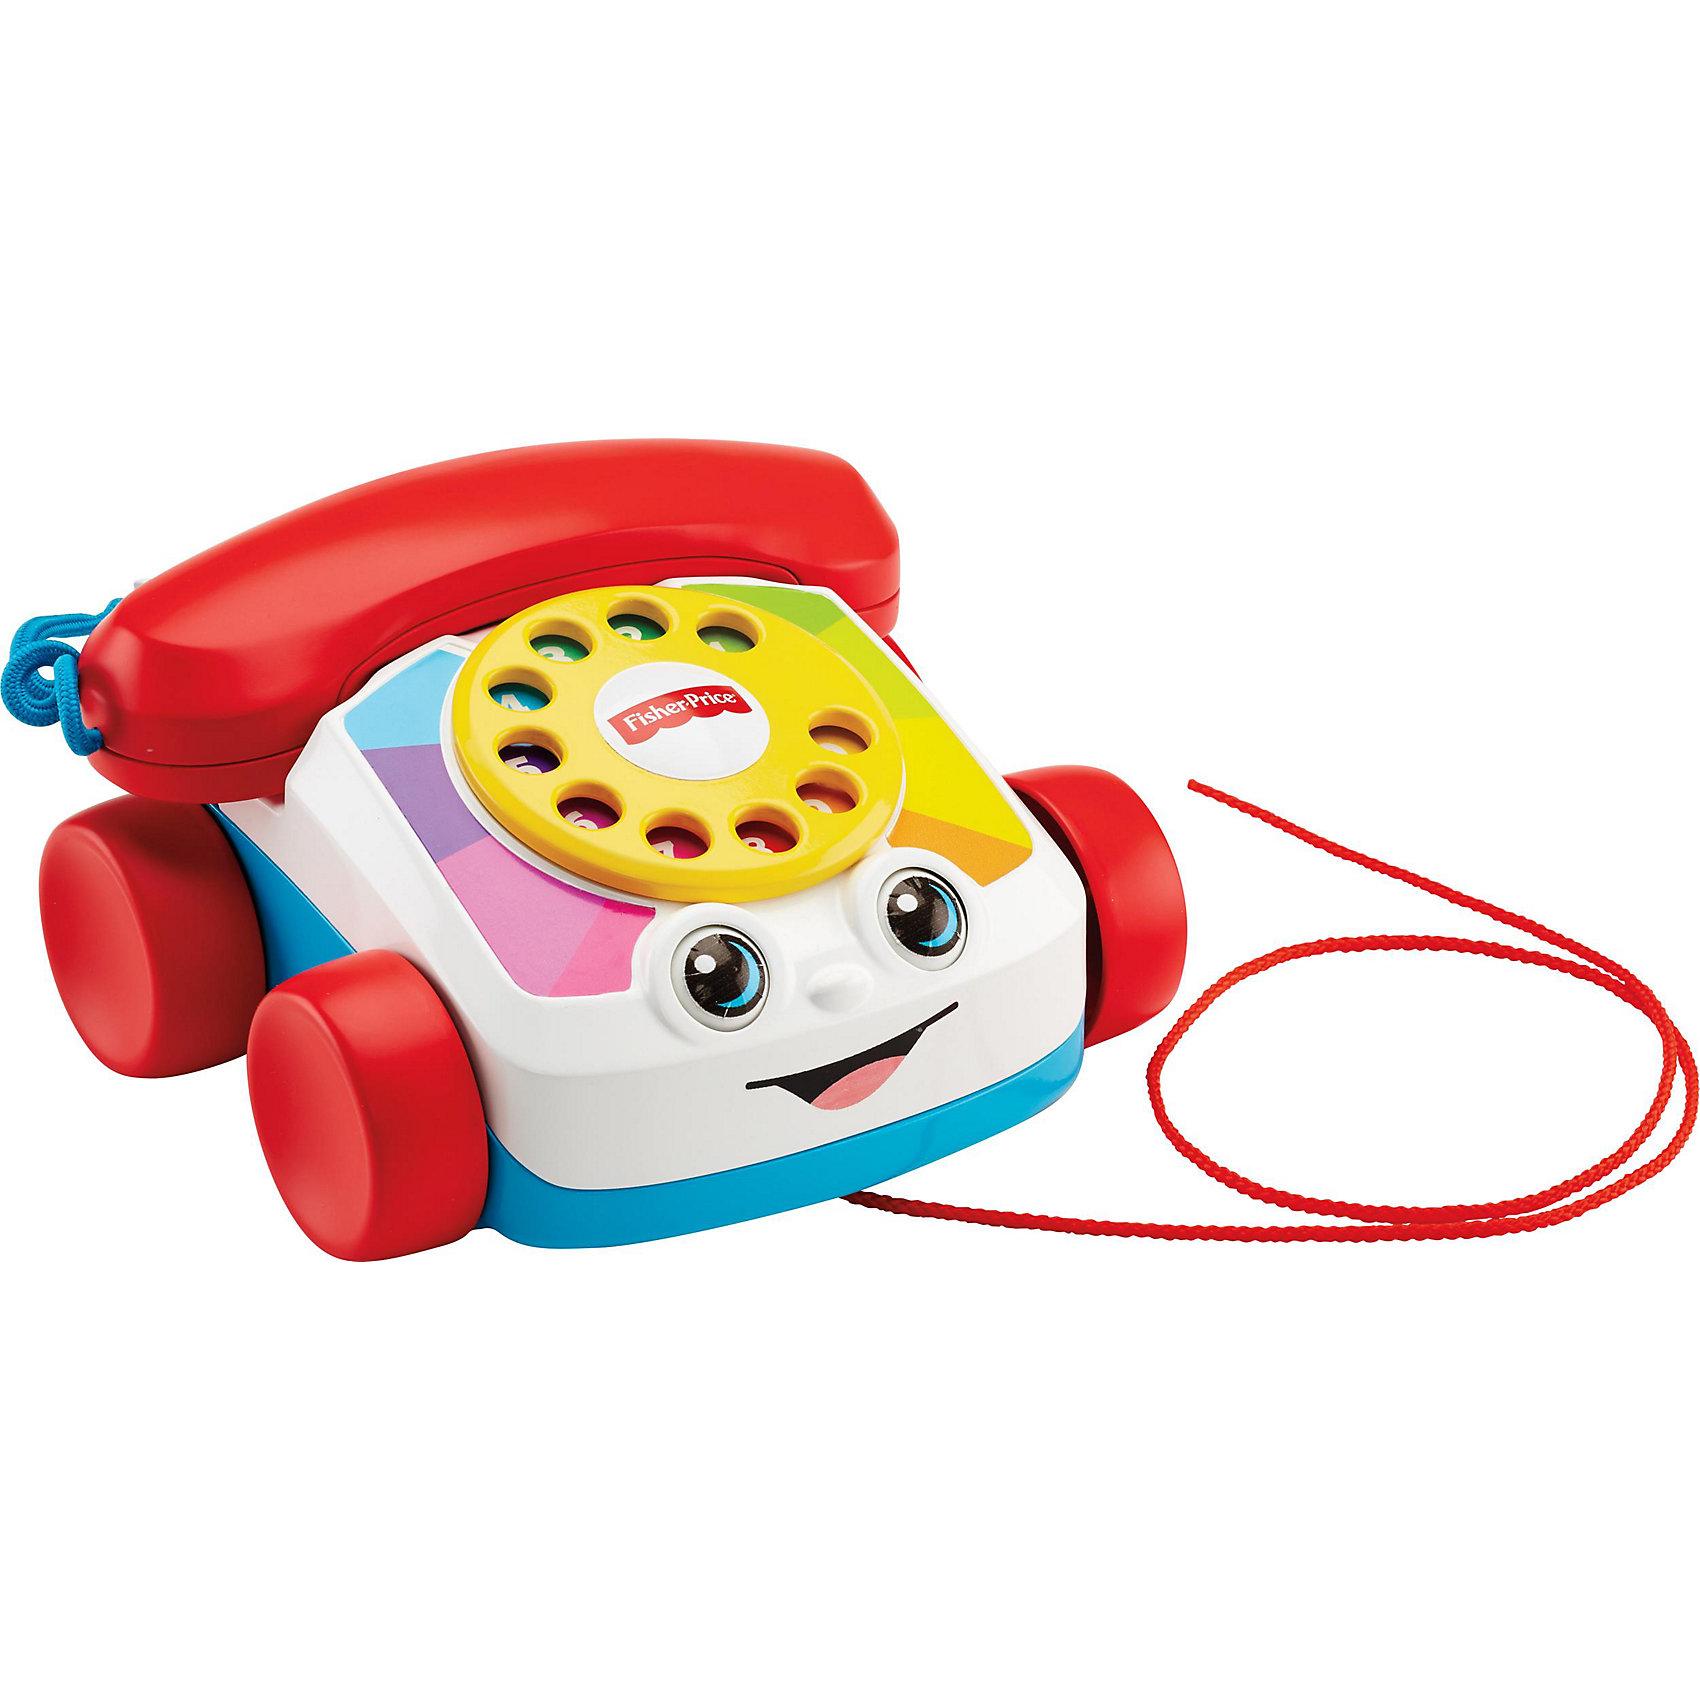 Mattel Говорящий телефон на колесах, Fisher Price автодома на колесах бу купить в испании